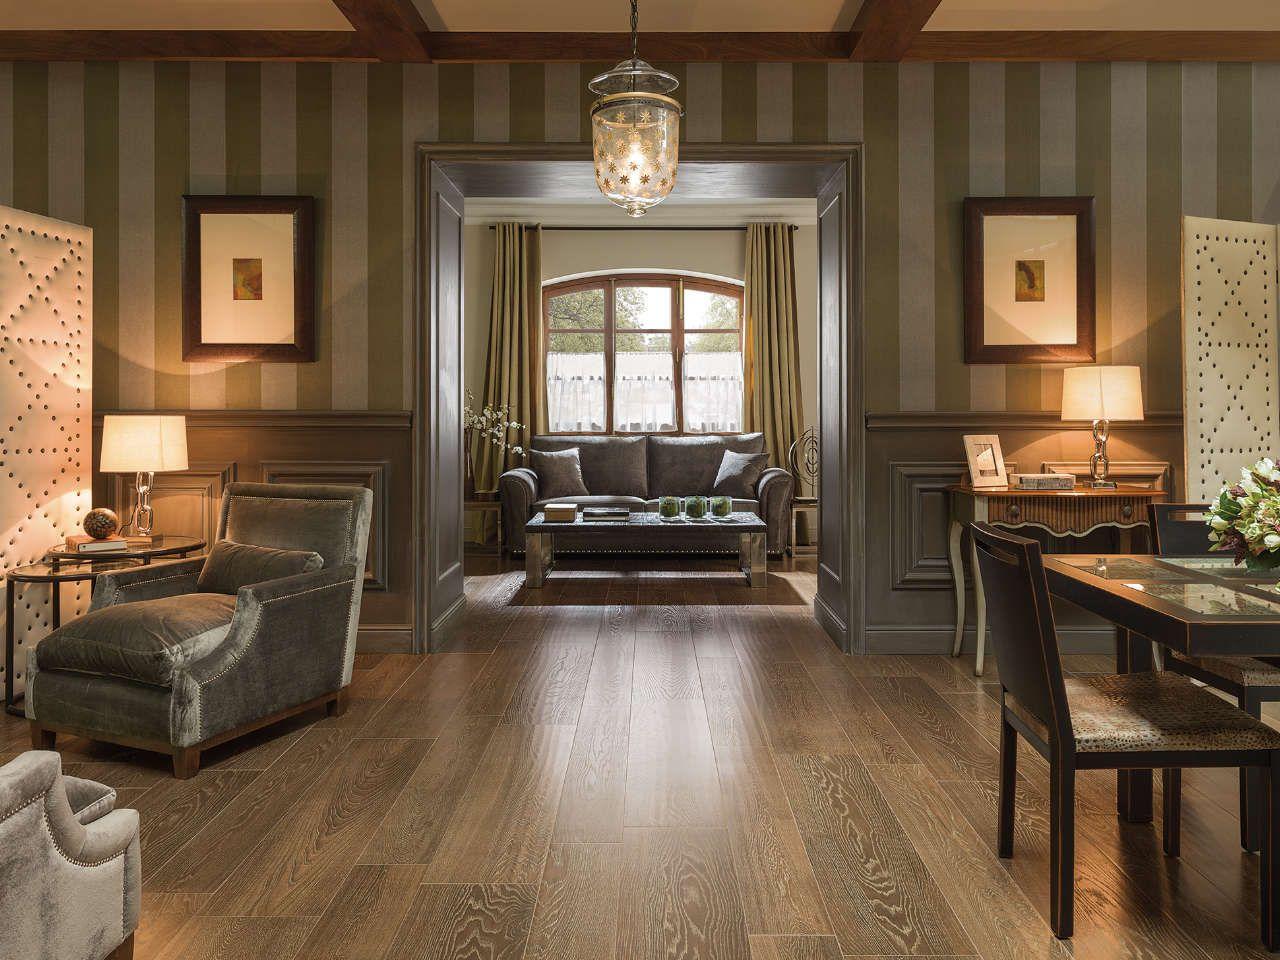 London casta o 19 3x120 cm 29 4x120 cm reforma piso - Plaquetas para suelos ...